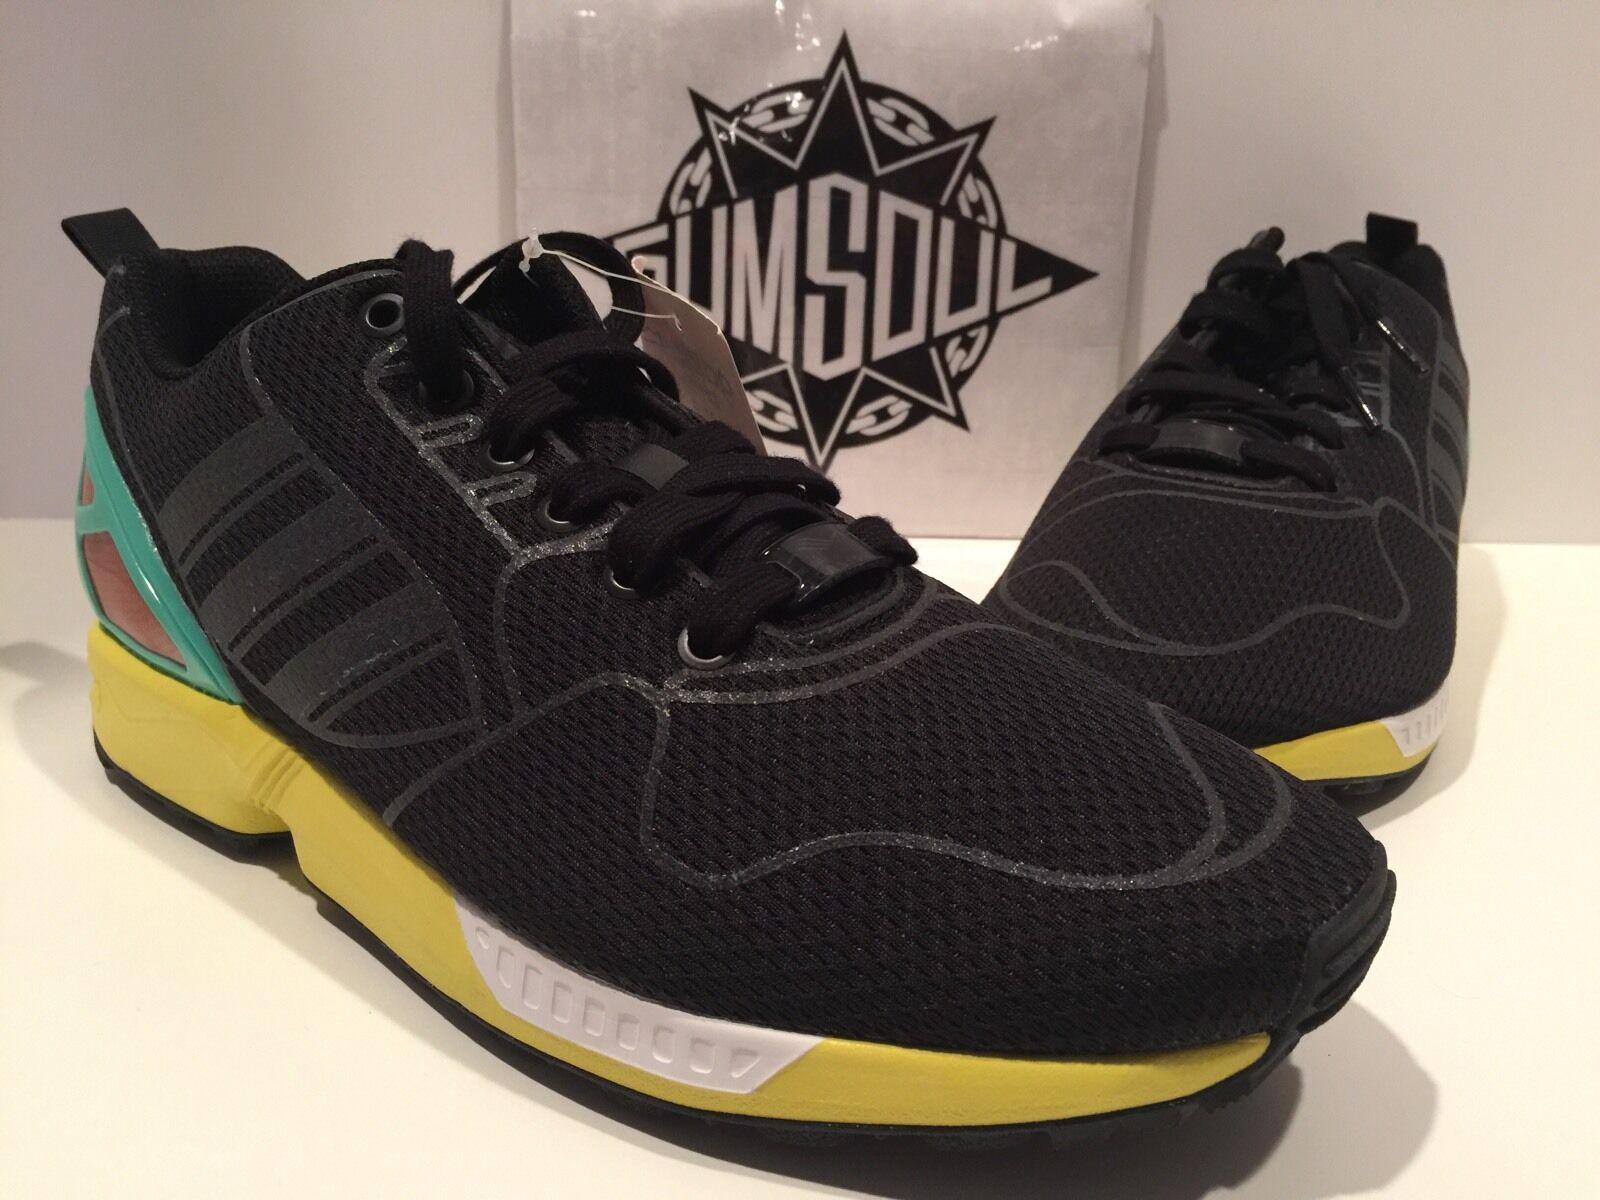 Adidas originals zx - flux 3m - pendler - packung 3m flux nur 333 - paare b24619 384f33